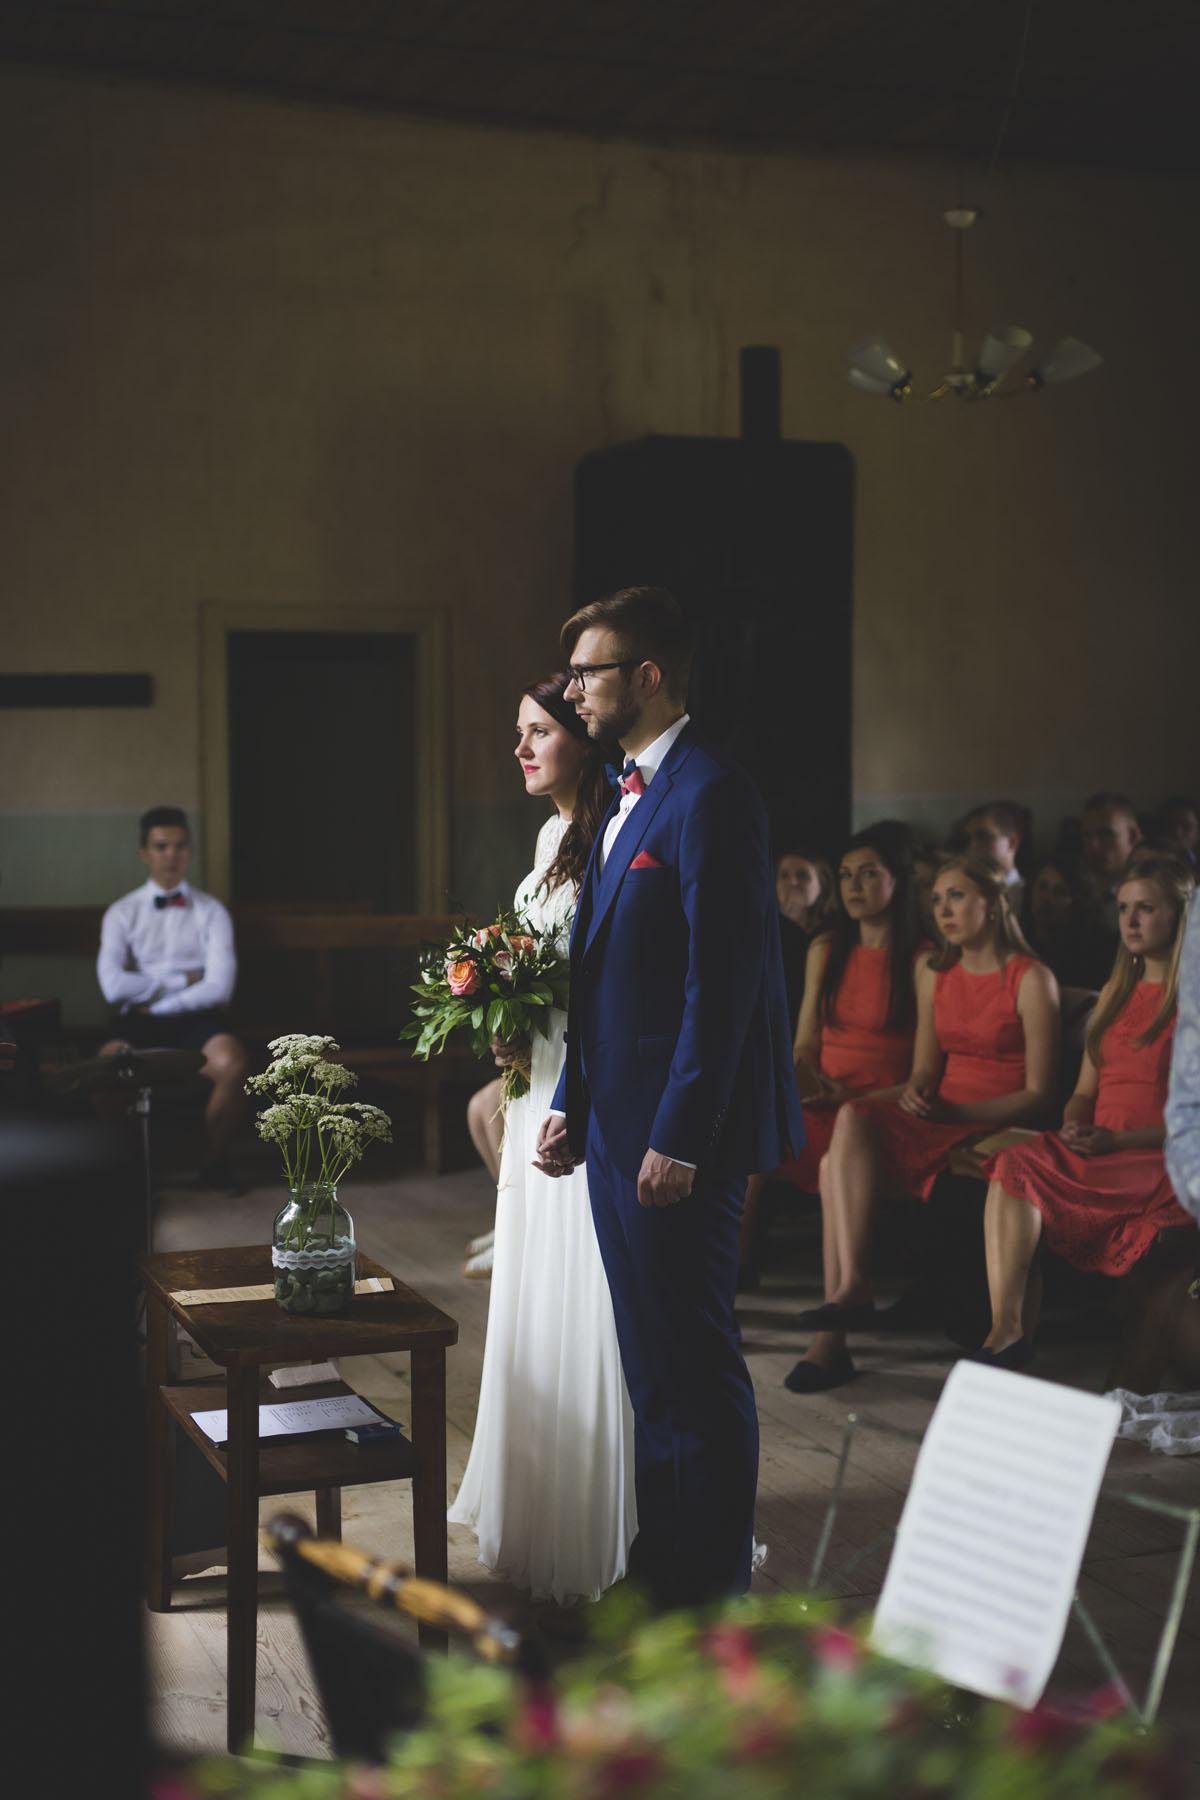 wedding-photos-072-hipster-wedding.jpg